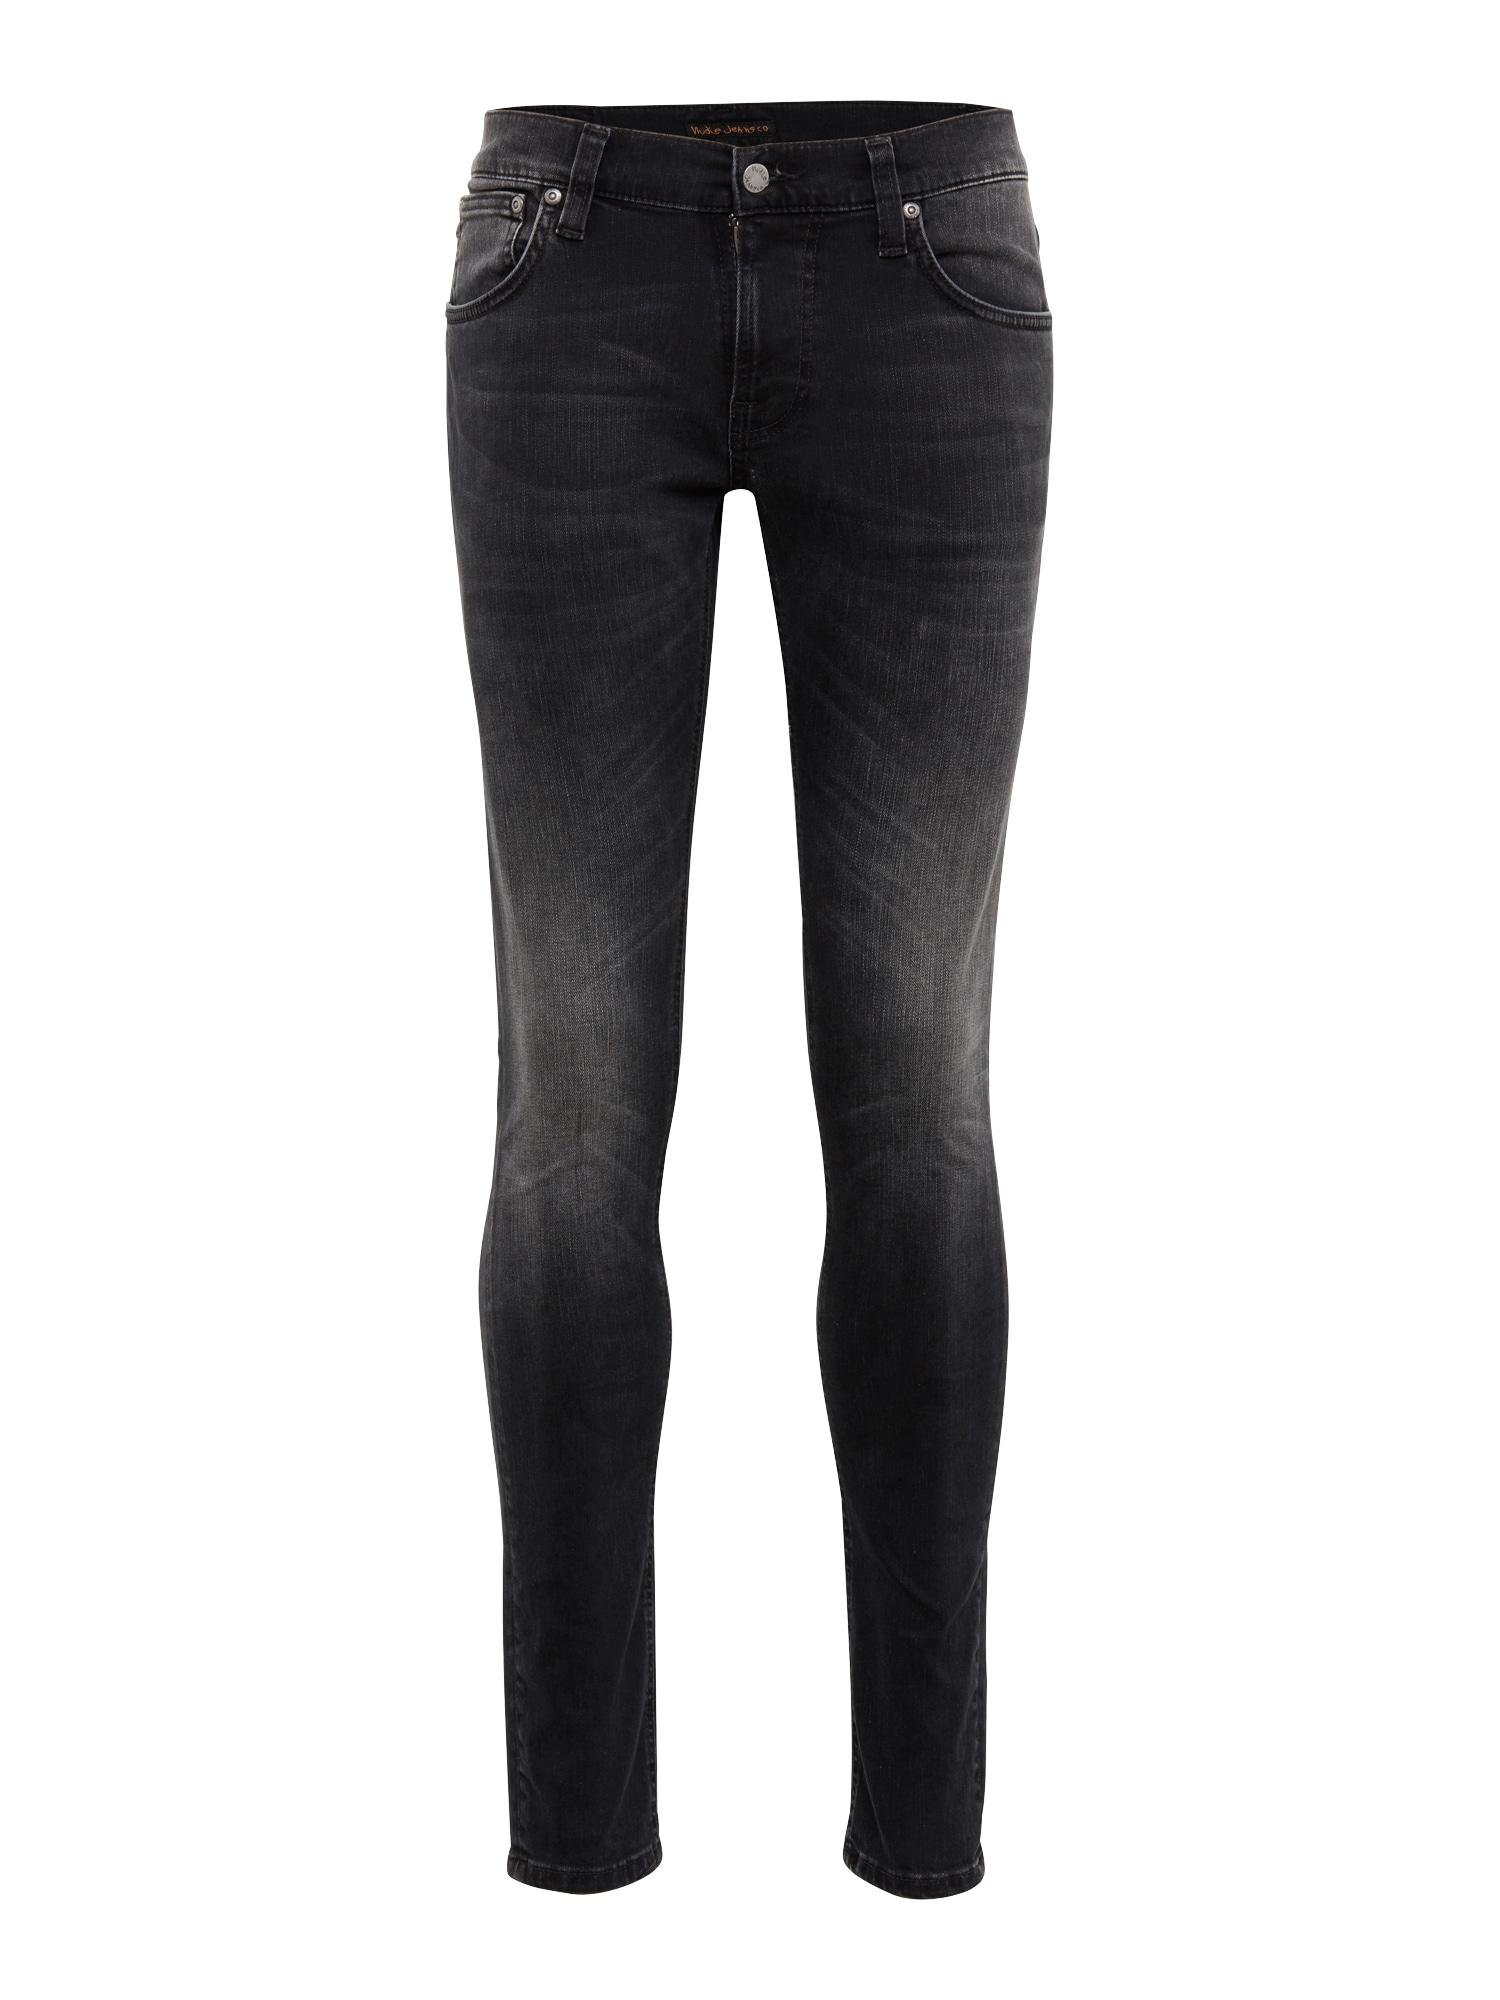 Džíny Tight Terry černá džínovina Nudie Jeans Co